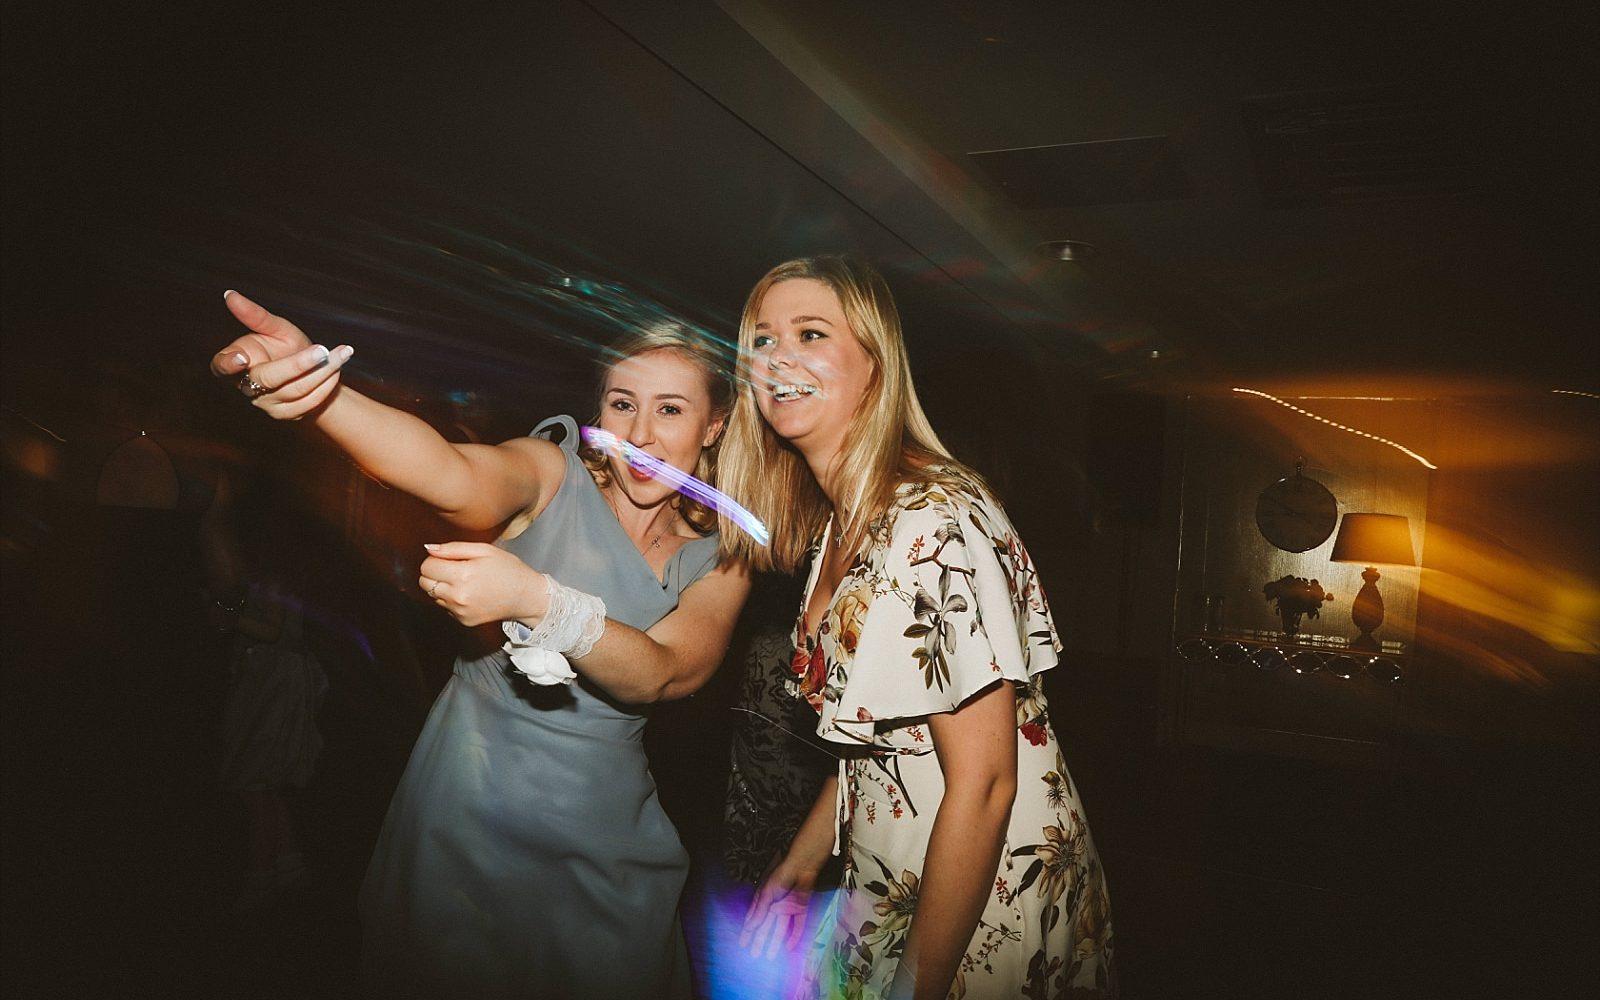 Ribby-Hall-Village-Weddings-Wedding-embee-Photographer-Photography-Lancashire0214